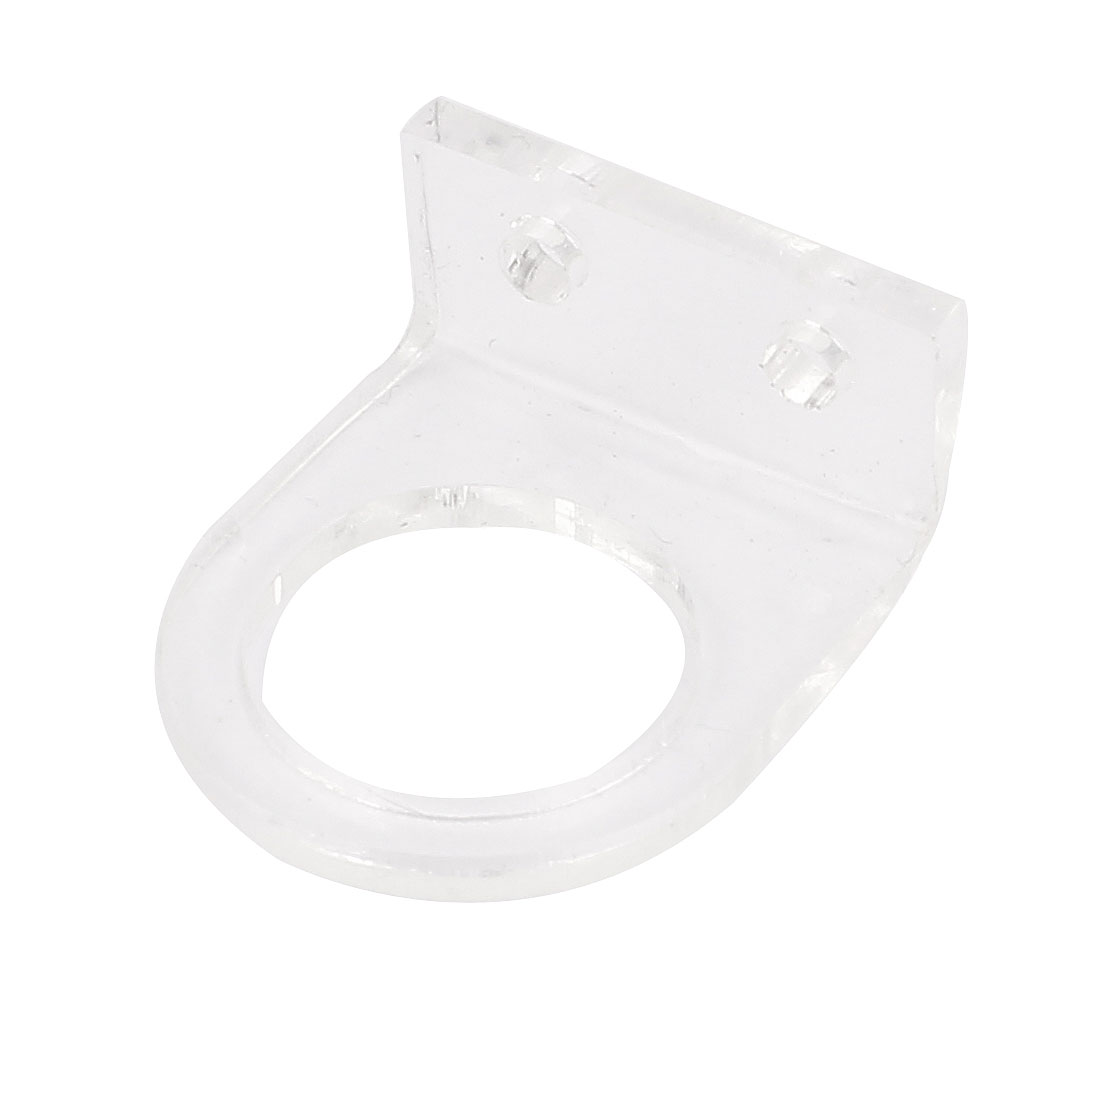 E18 Photoelectric Infrared Obstacle Avoidance Sensor Support Bracket